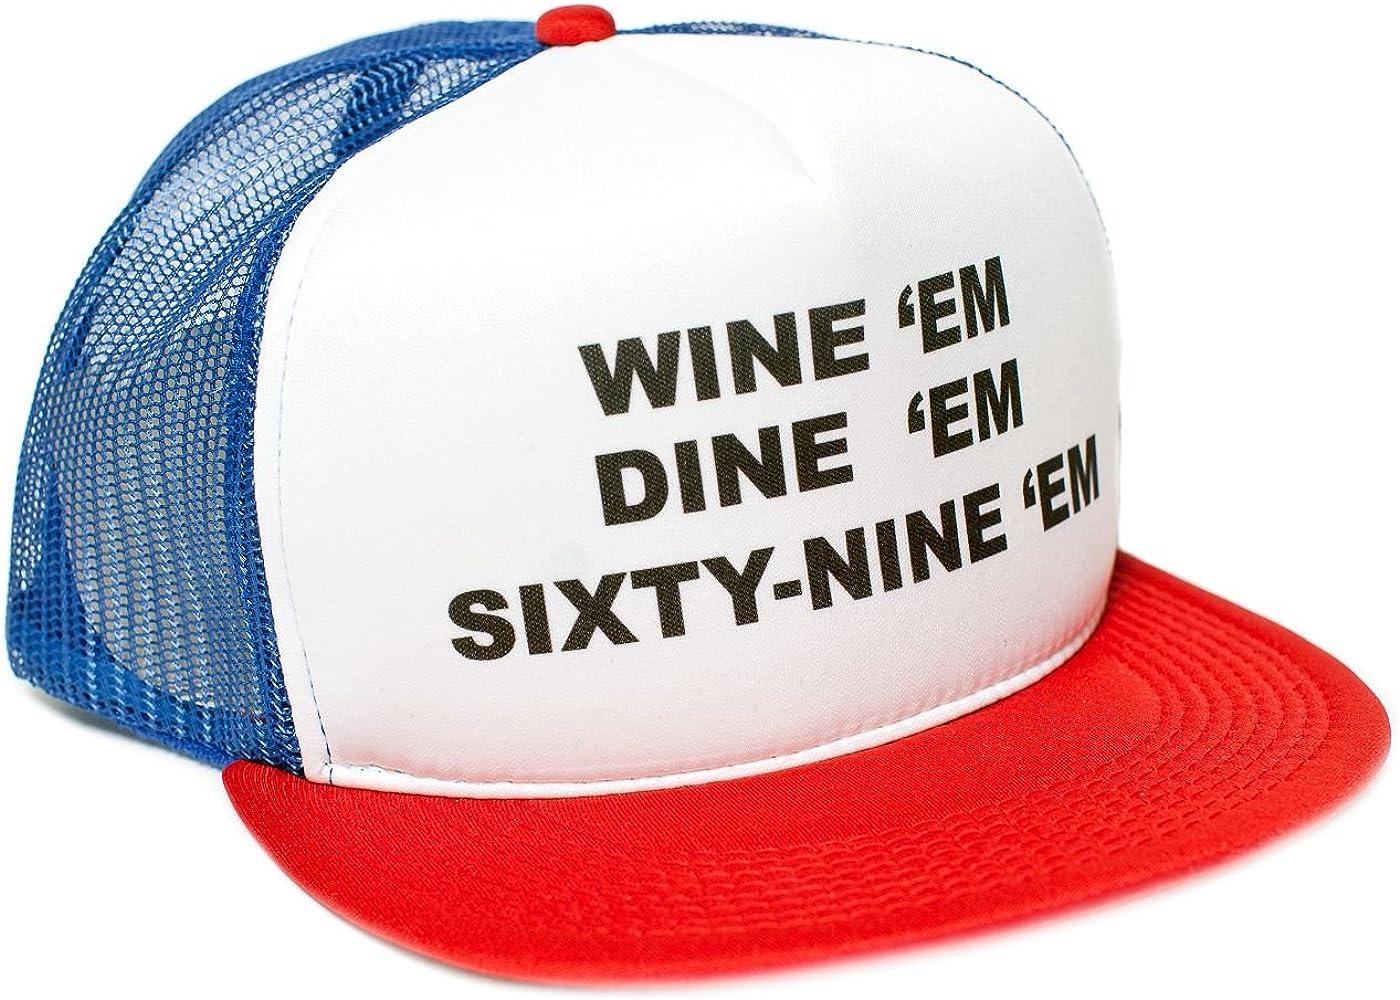 Wine Em Dine Reservation Sixty Nine 69 High quality One-Size Bill Flat Unisex-Adult Tr